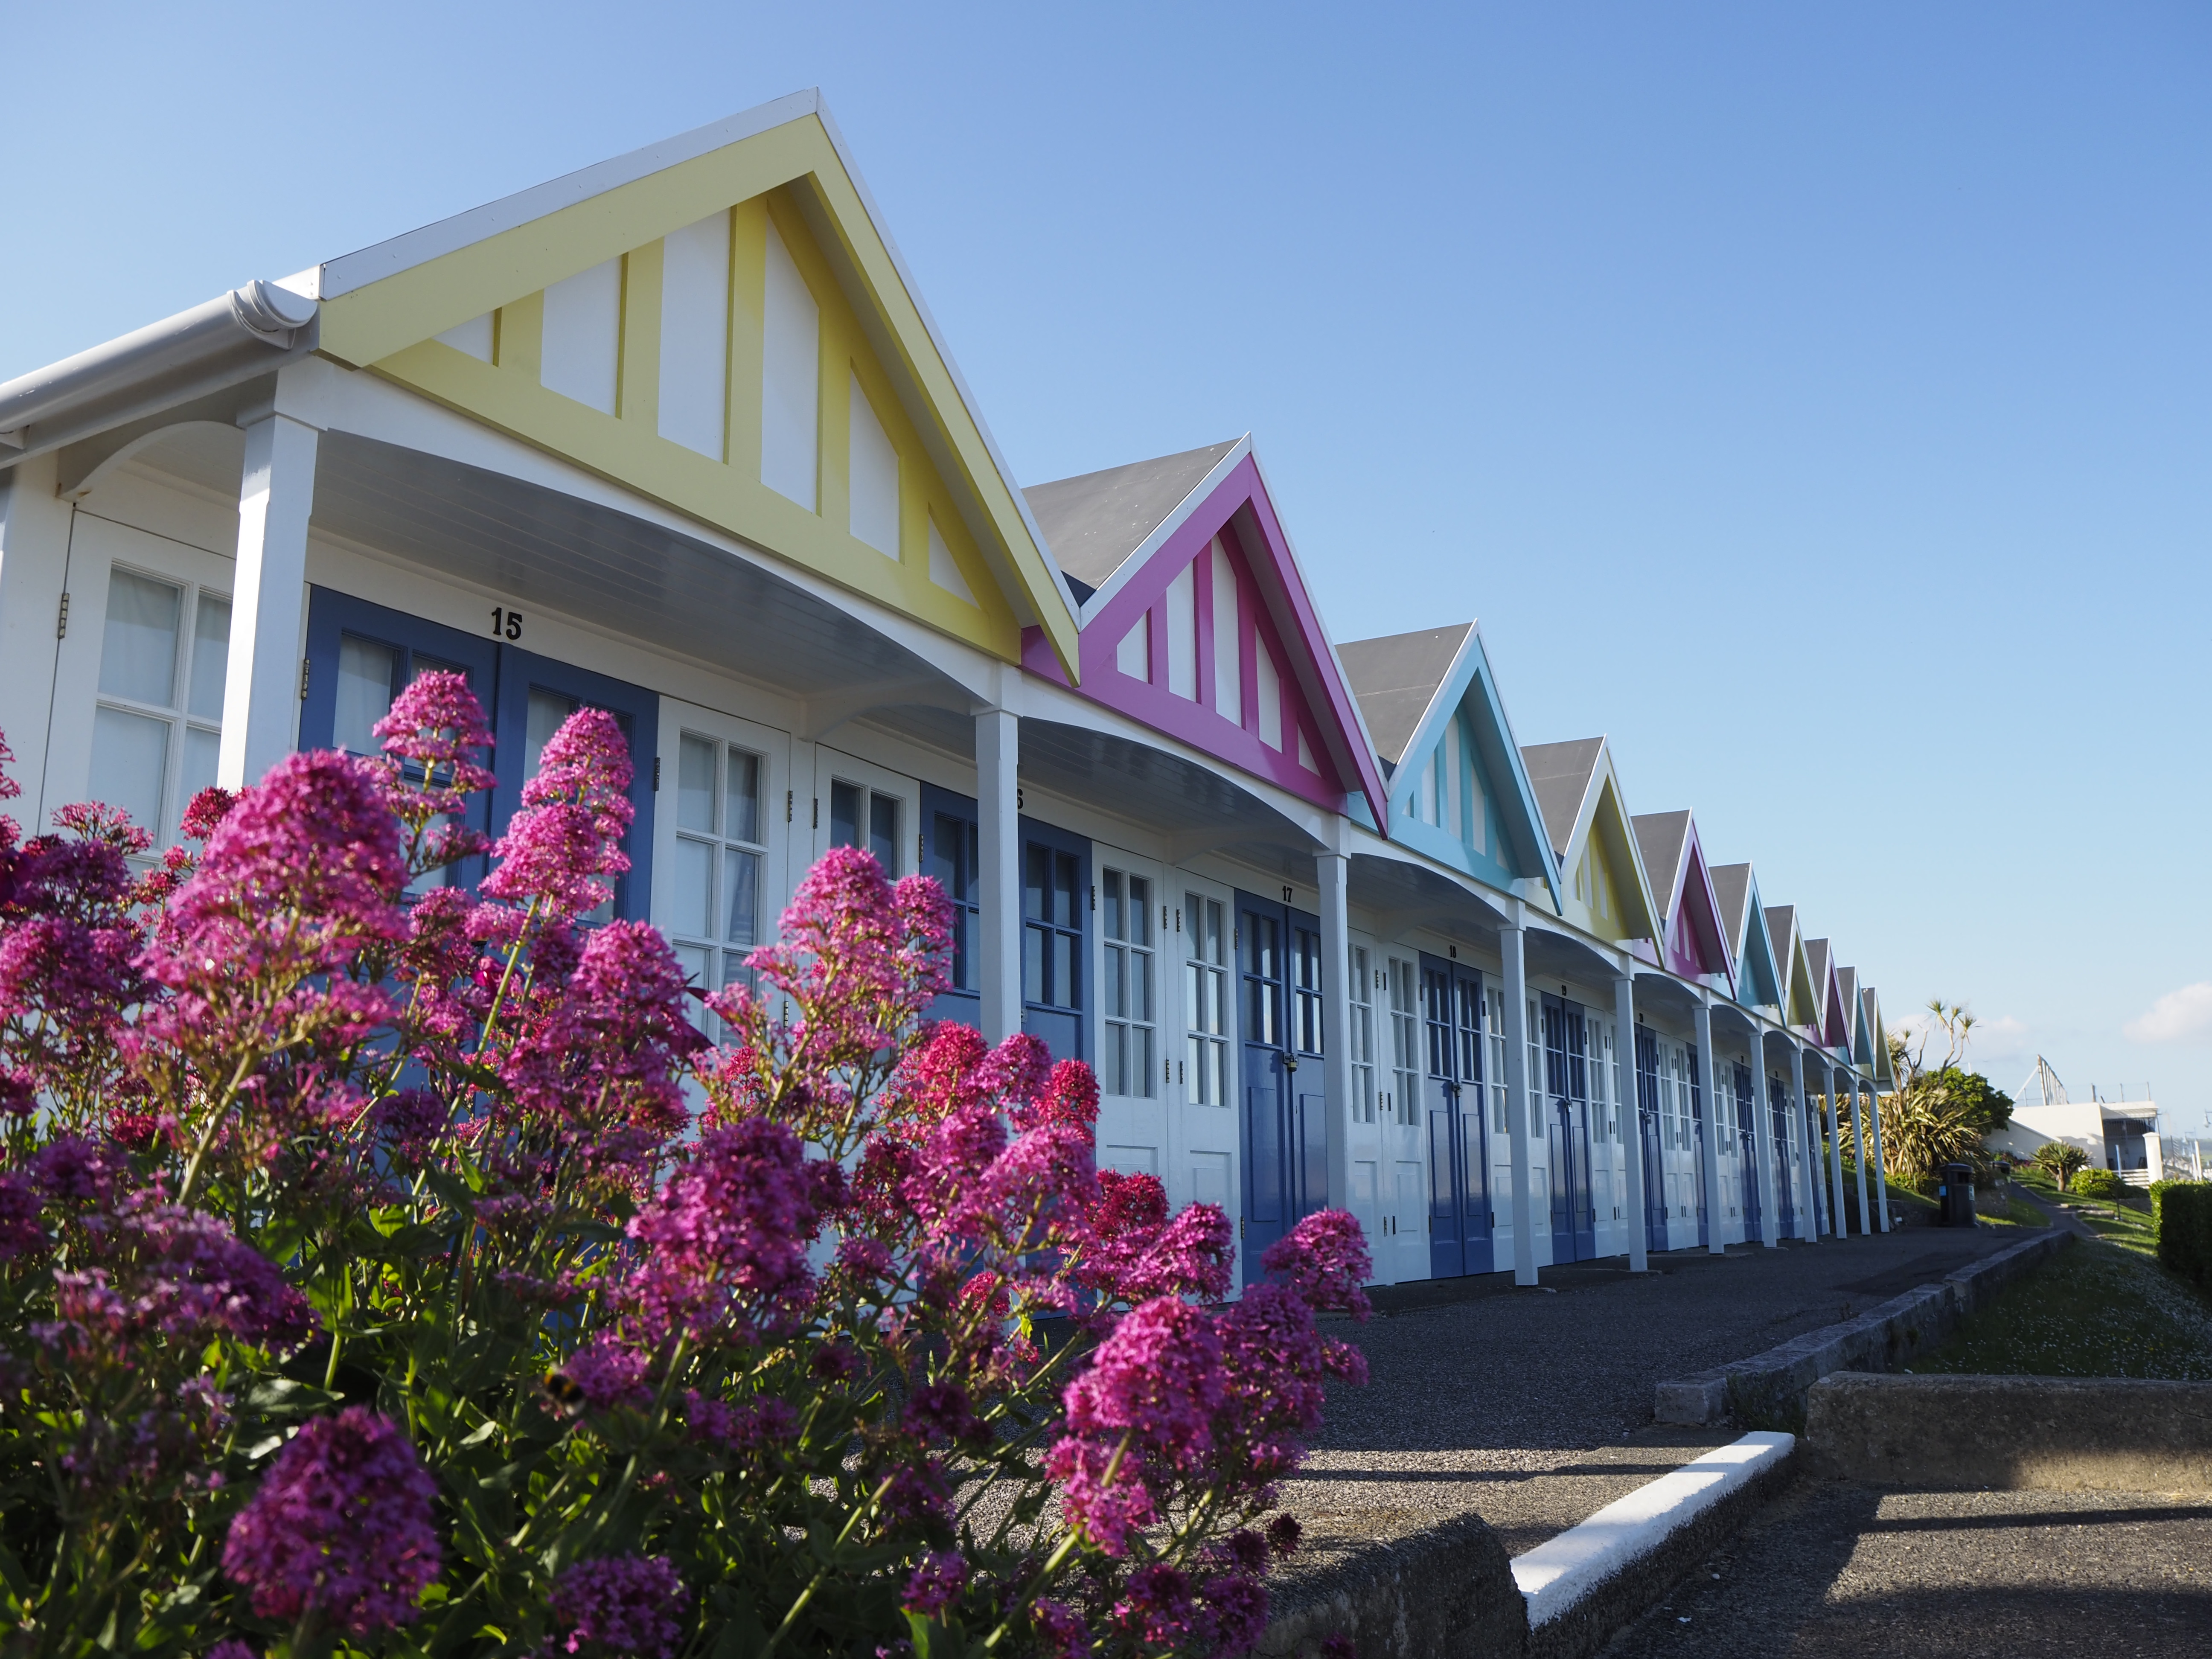 Photo of beach houses shot on the Olympus E-P7